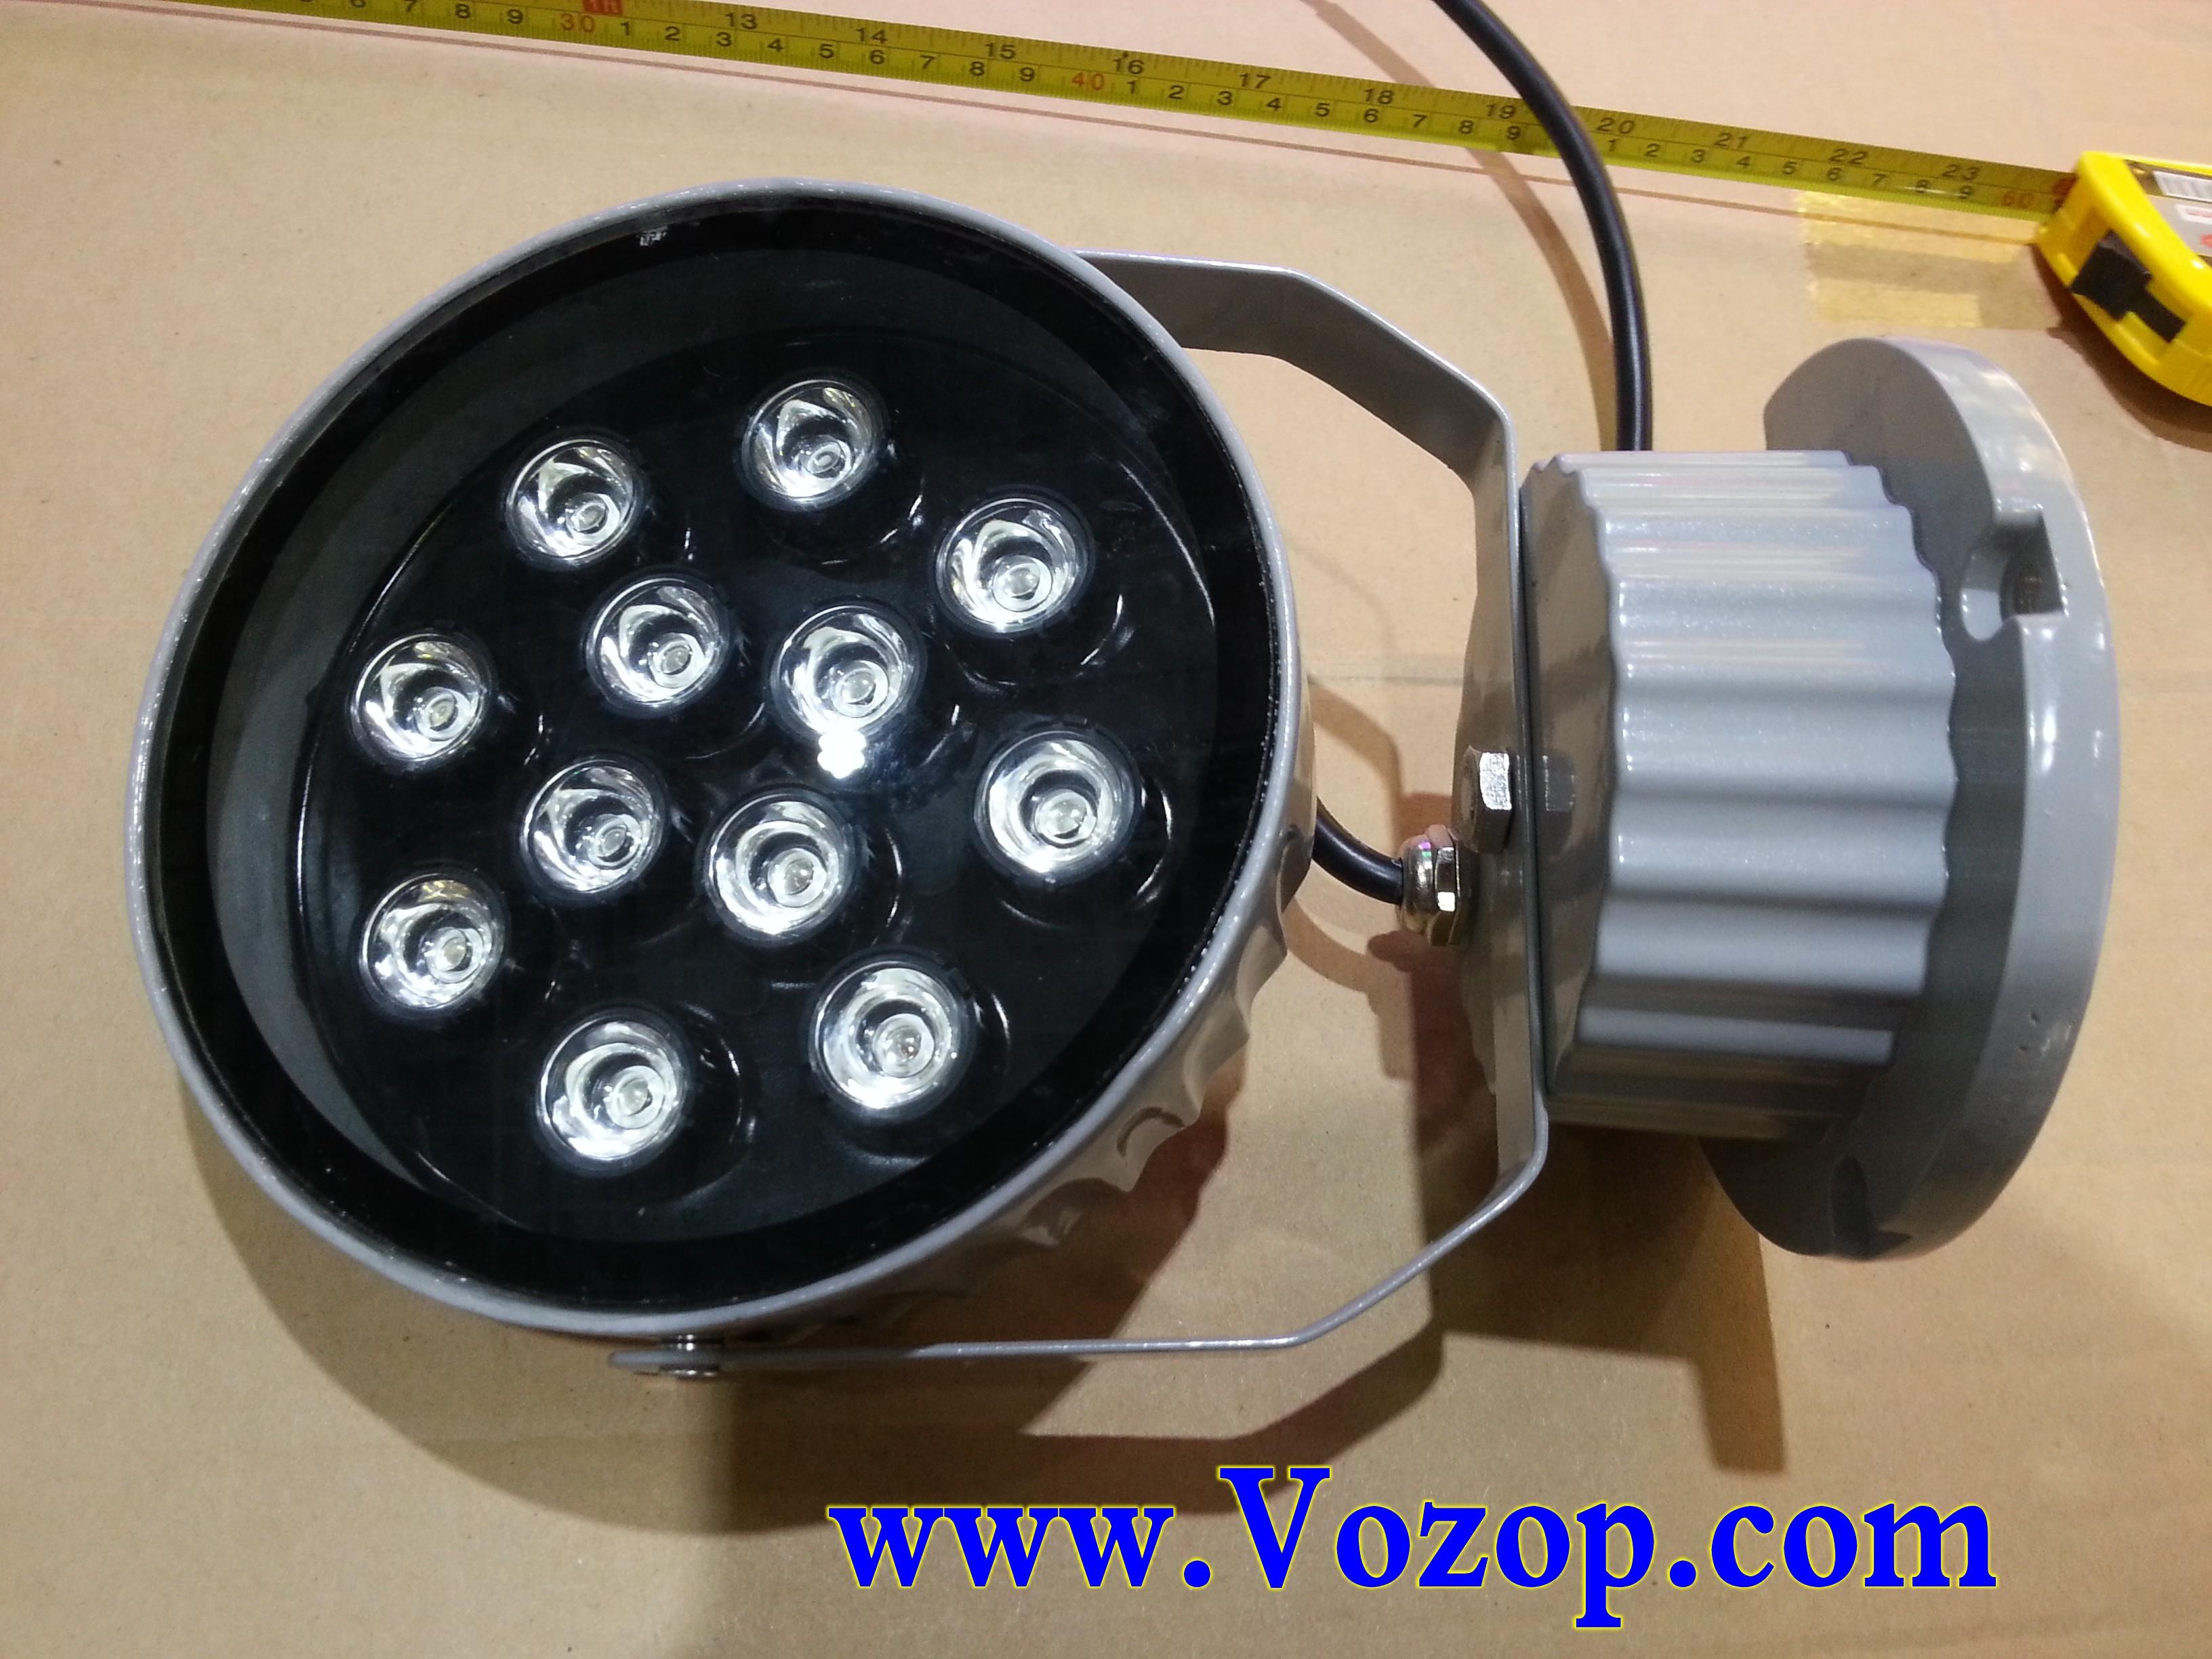 12W_Projecting_Light_Waterproof_Project_Lamp